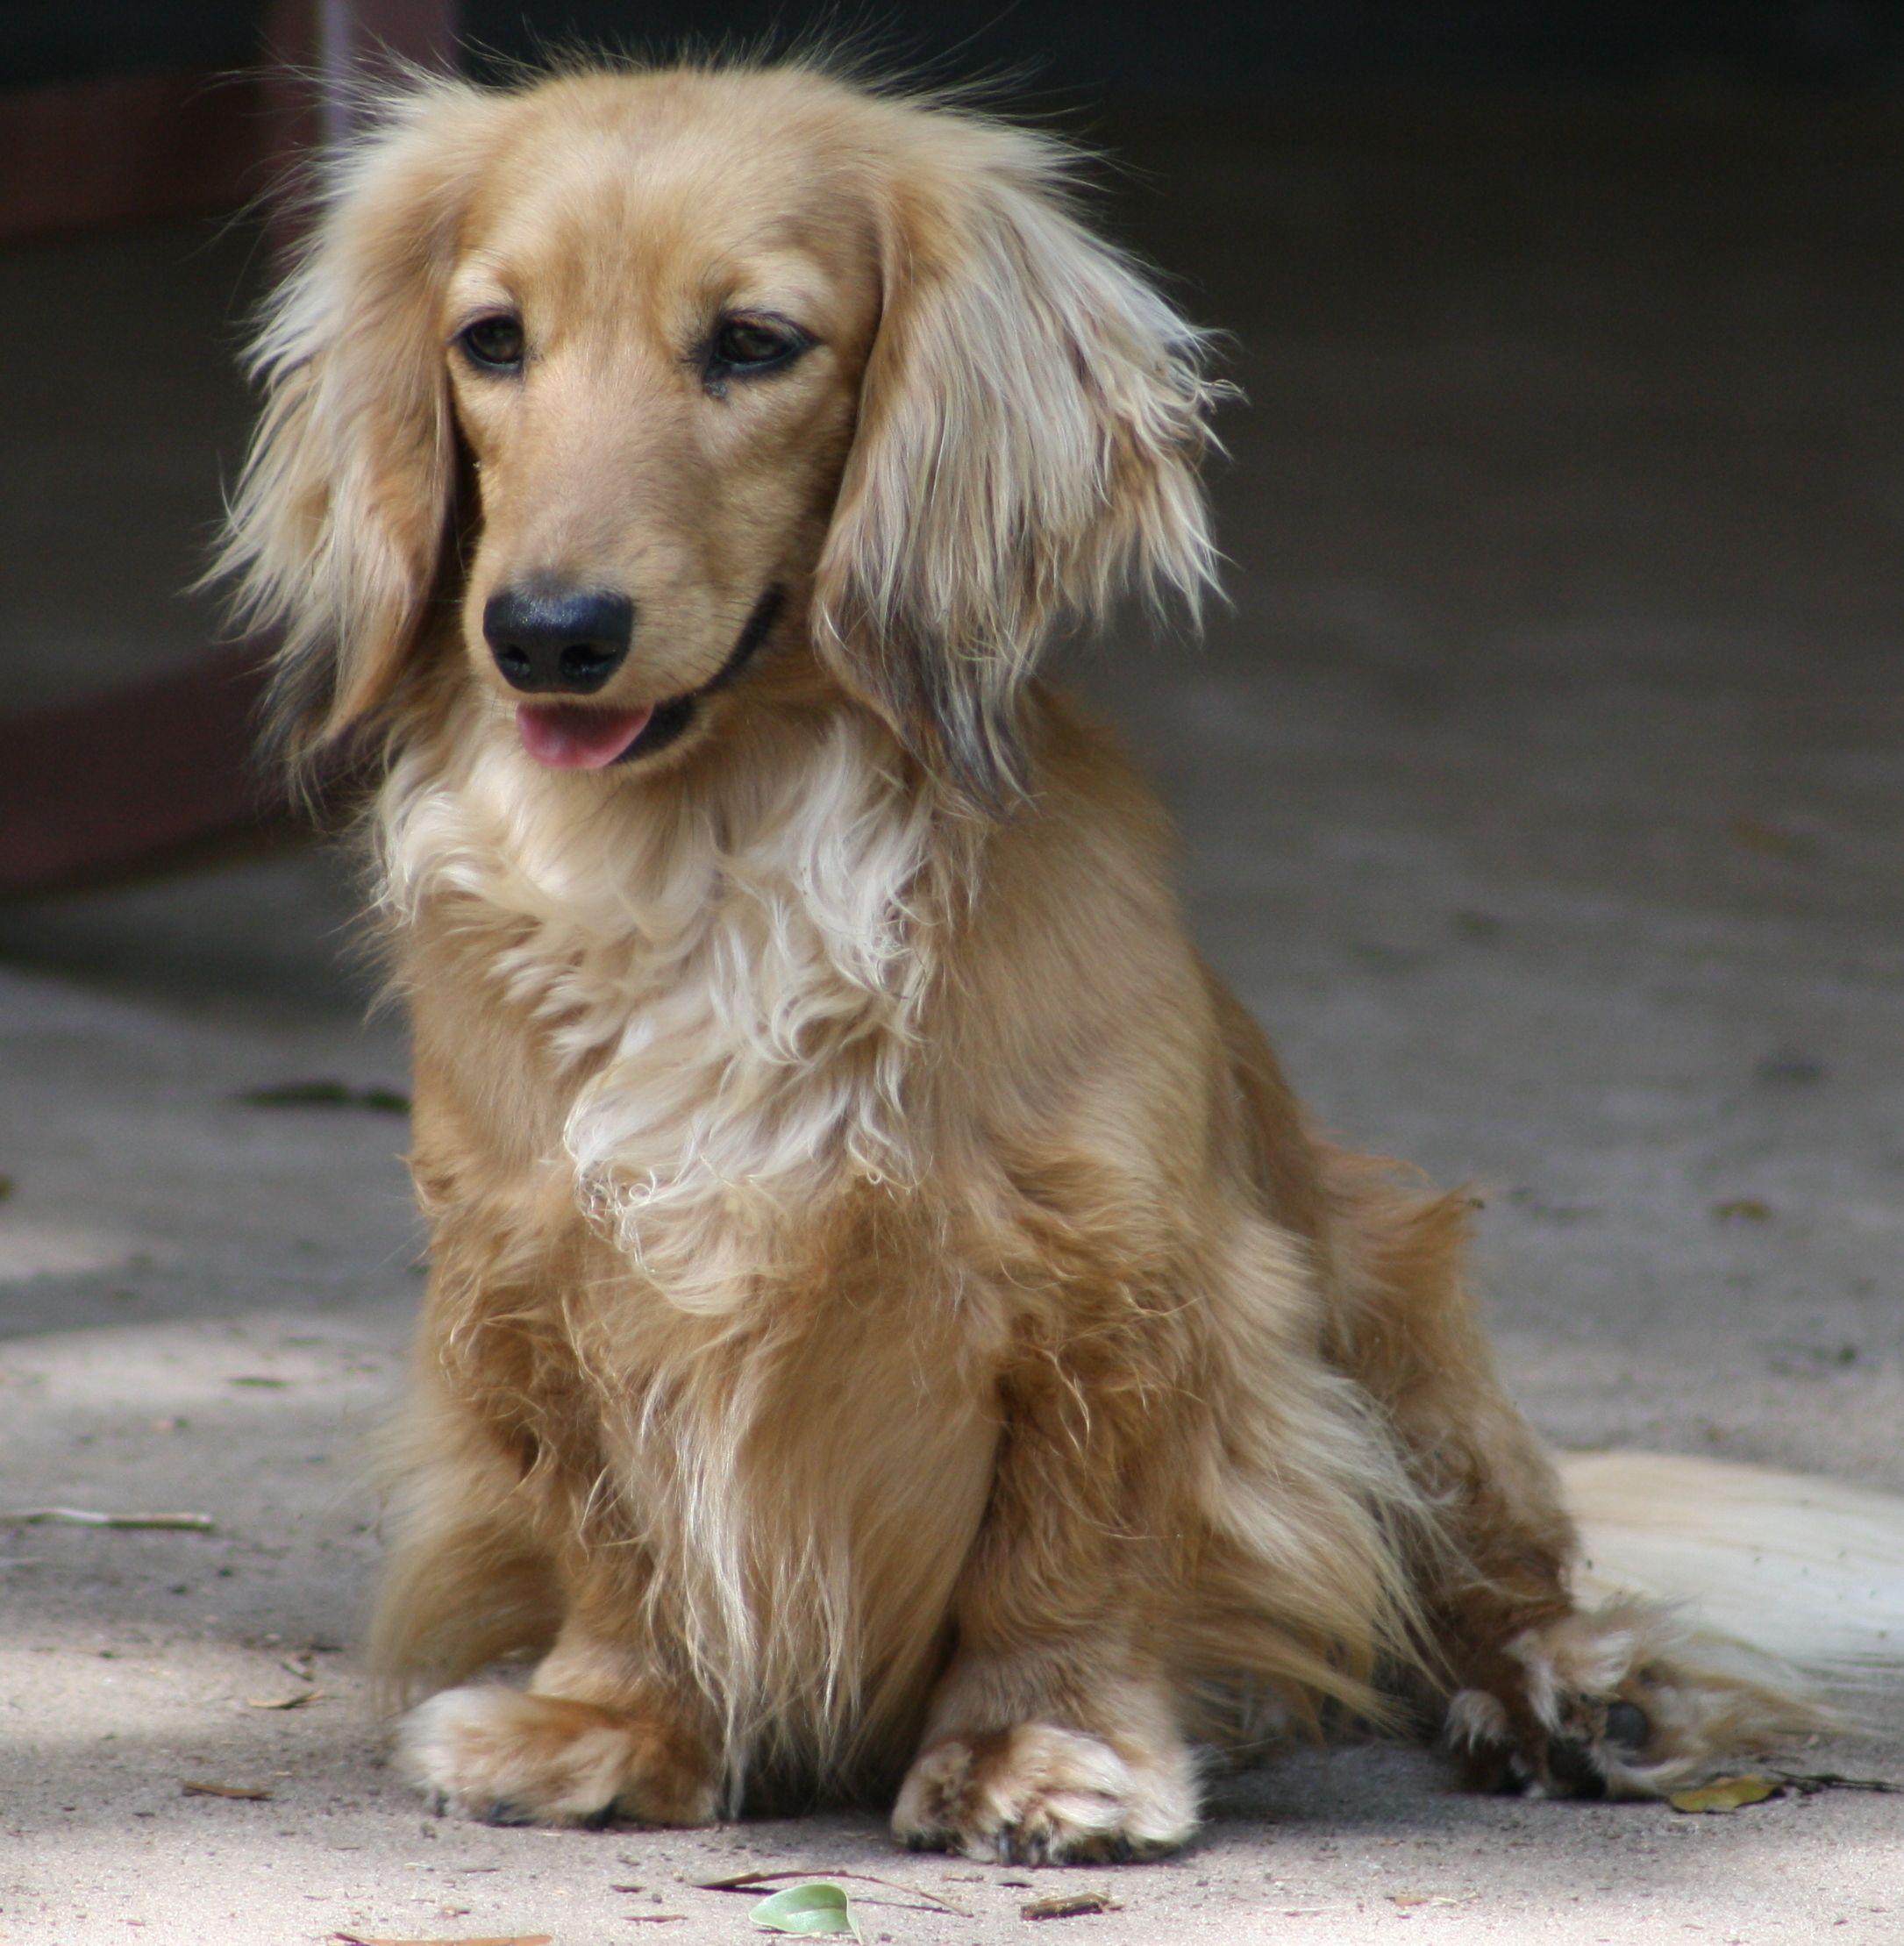 Dachshund Friendly and Curious Dachshund dog, Cream